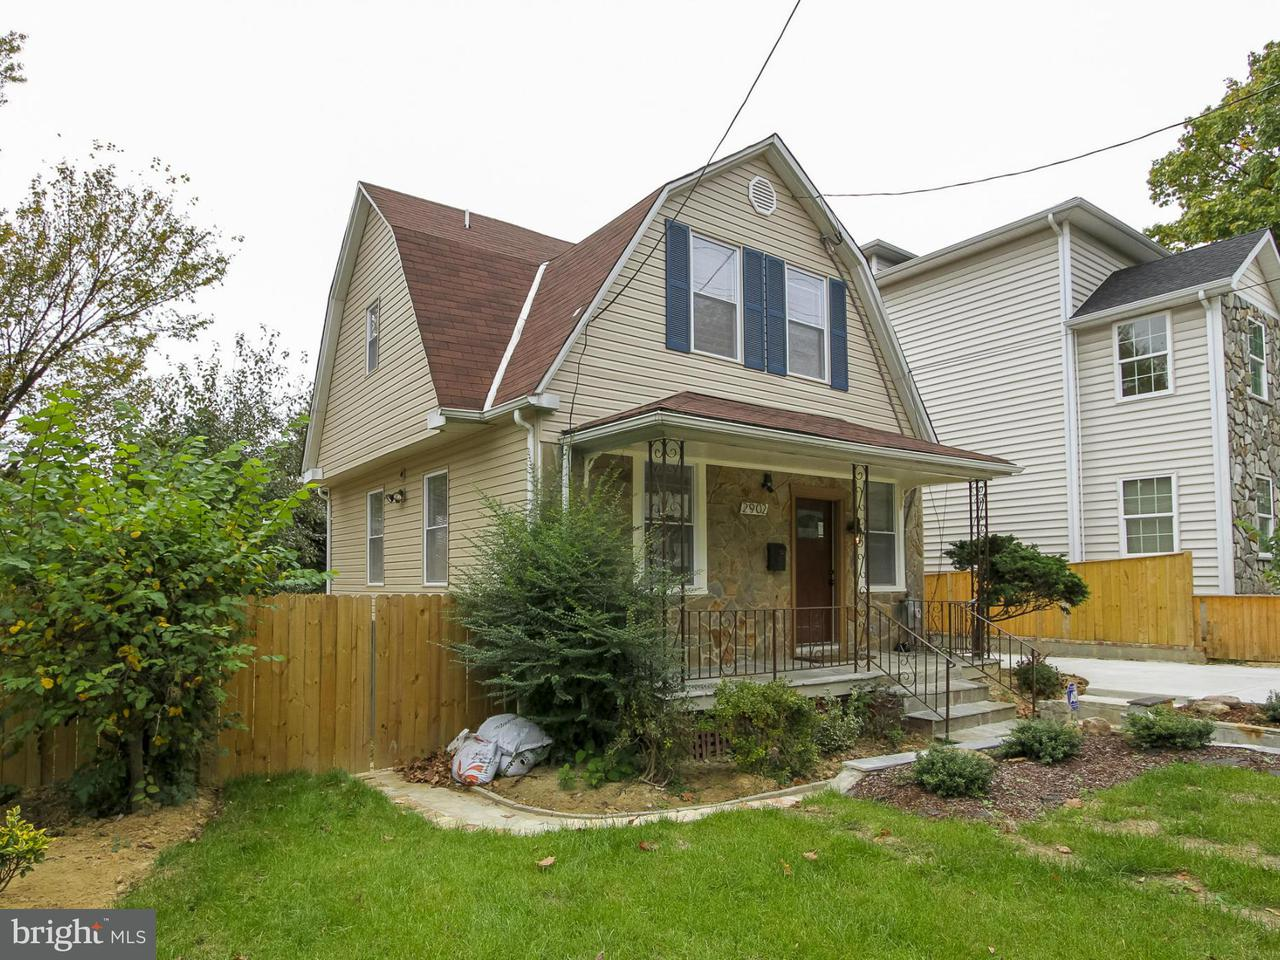 Additional photo for property listing at 2902 South Dakota Ave NE  Washington, District Of Columbia 20018 United States